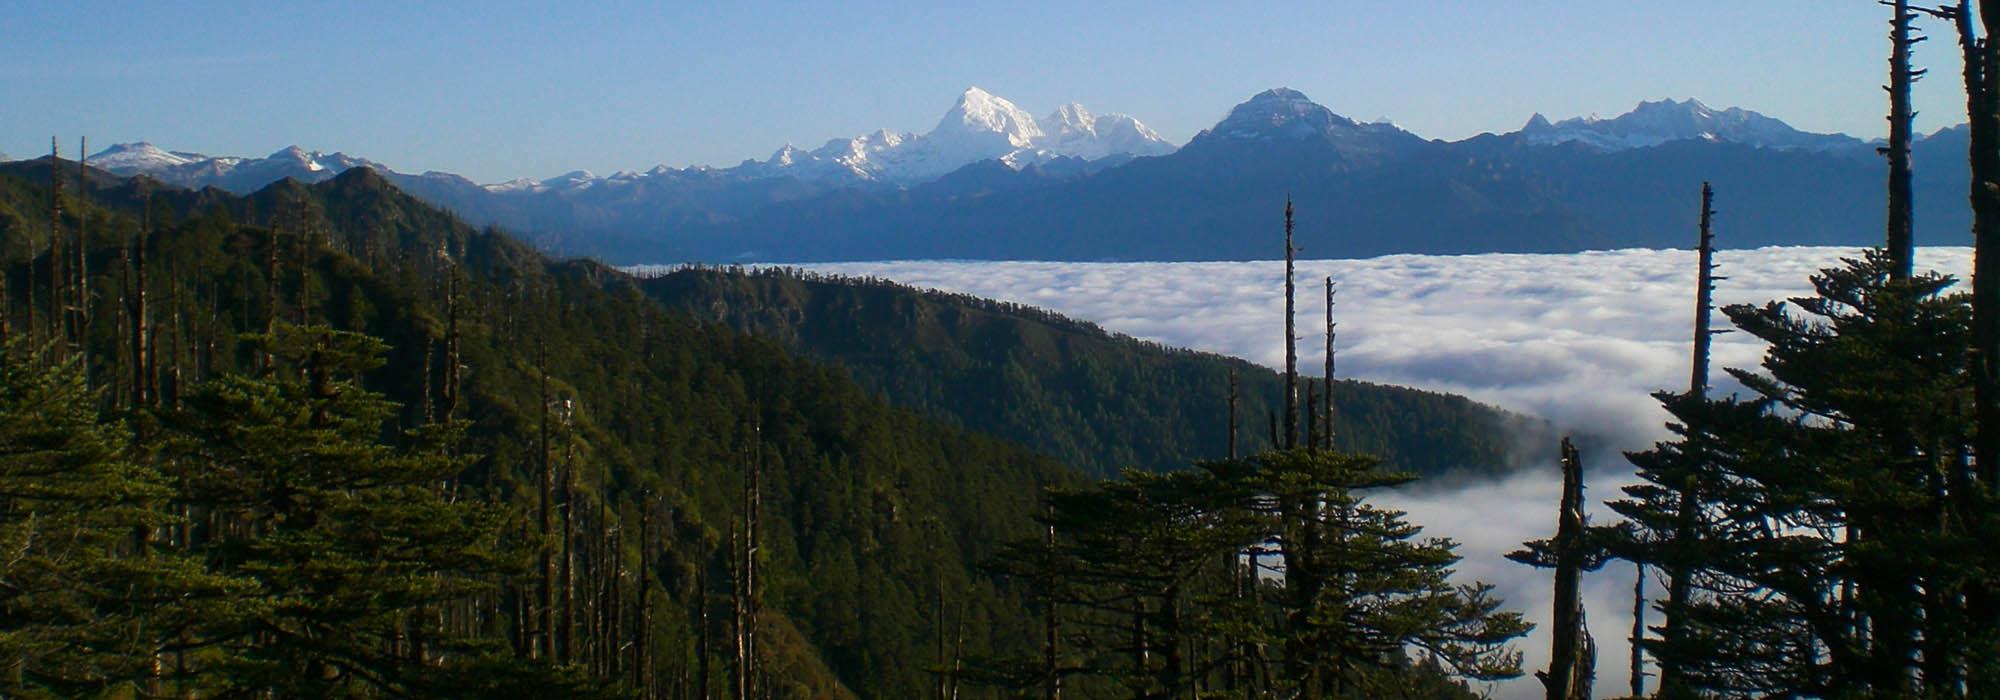 Bhutan Bumthang Cultural Trek